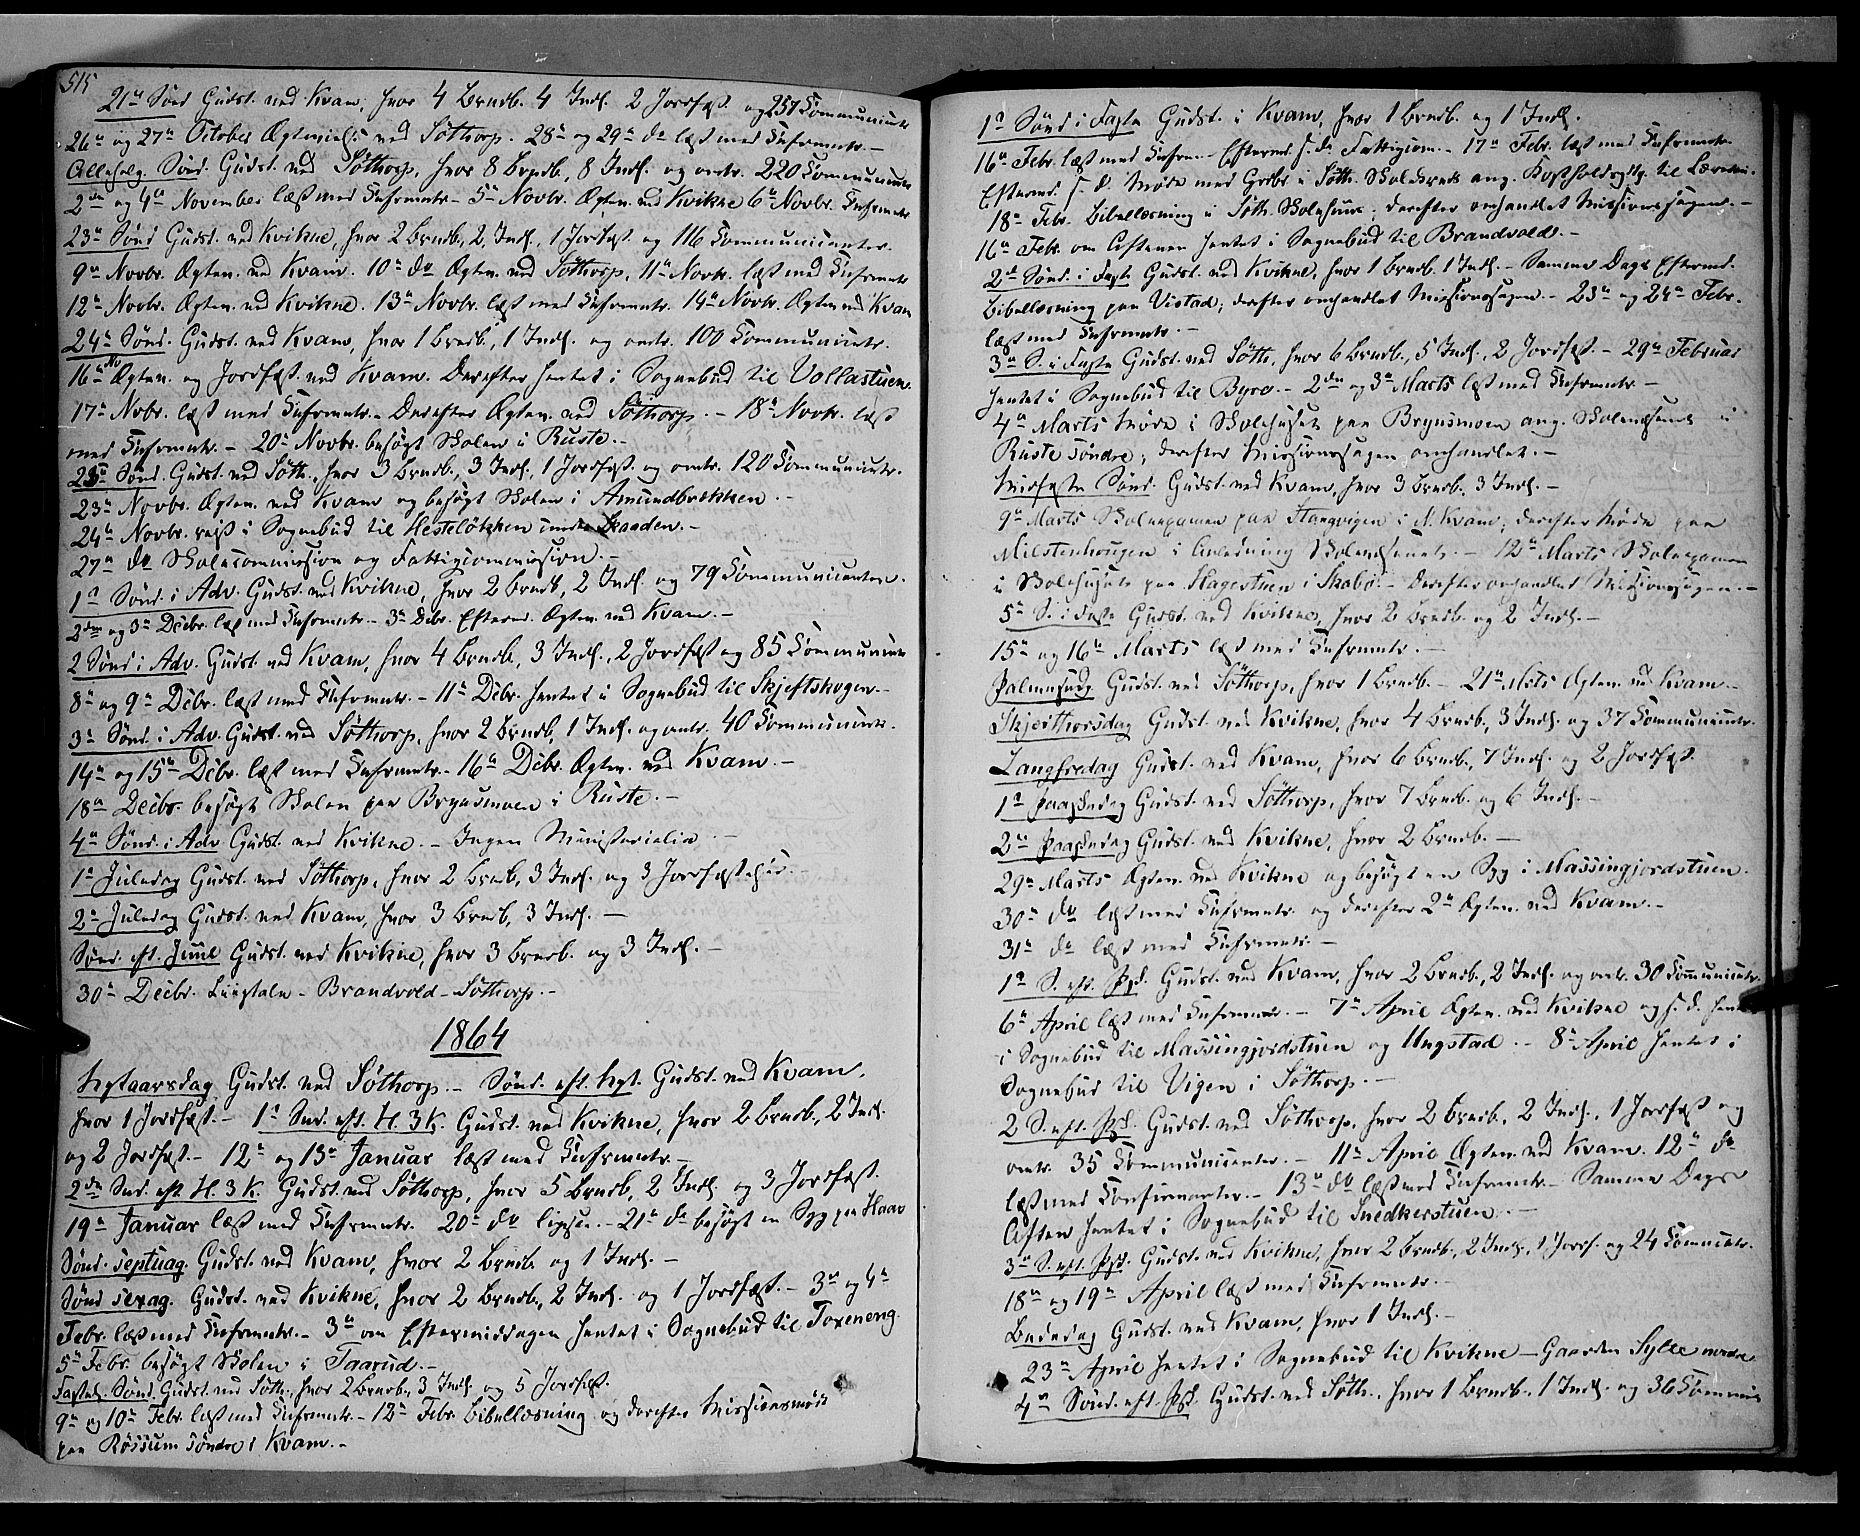 SAH, Nord-Fron prestekontor, Ministerialbok nr. 1, 1851-1864, s. 515